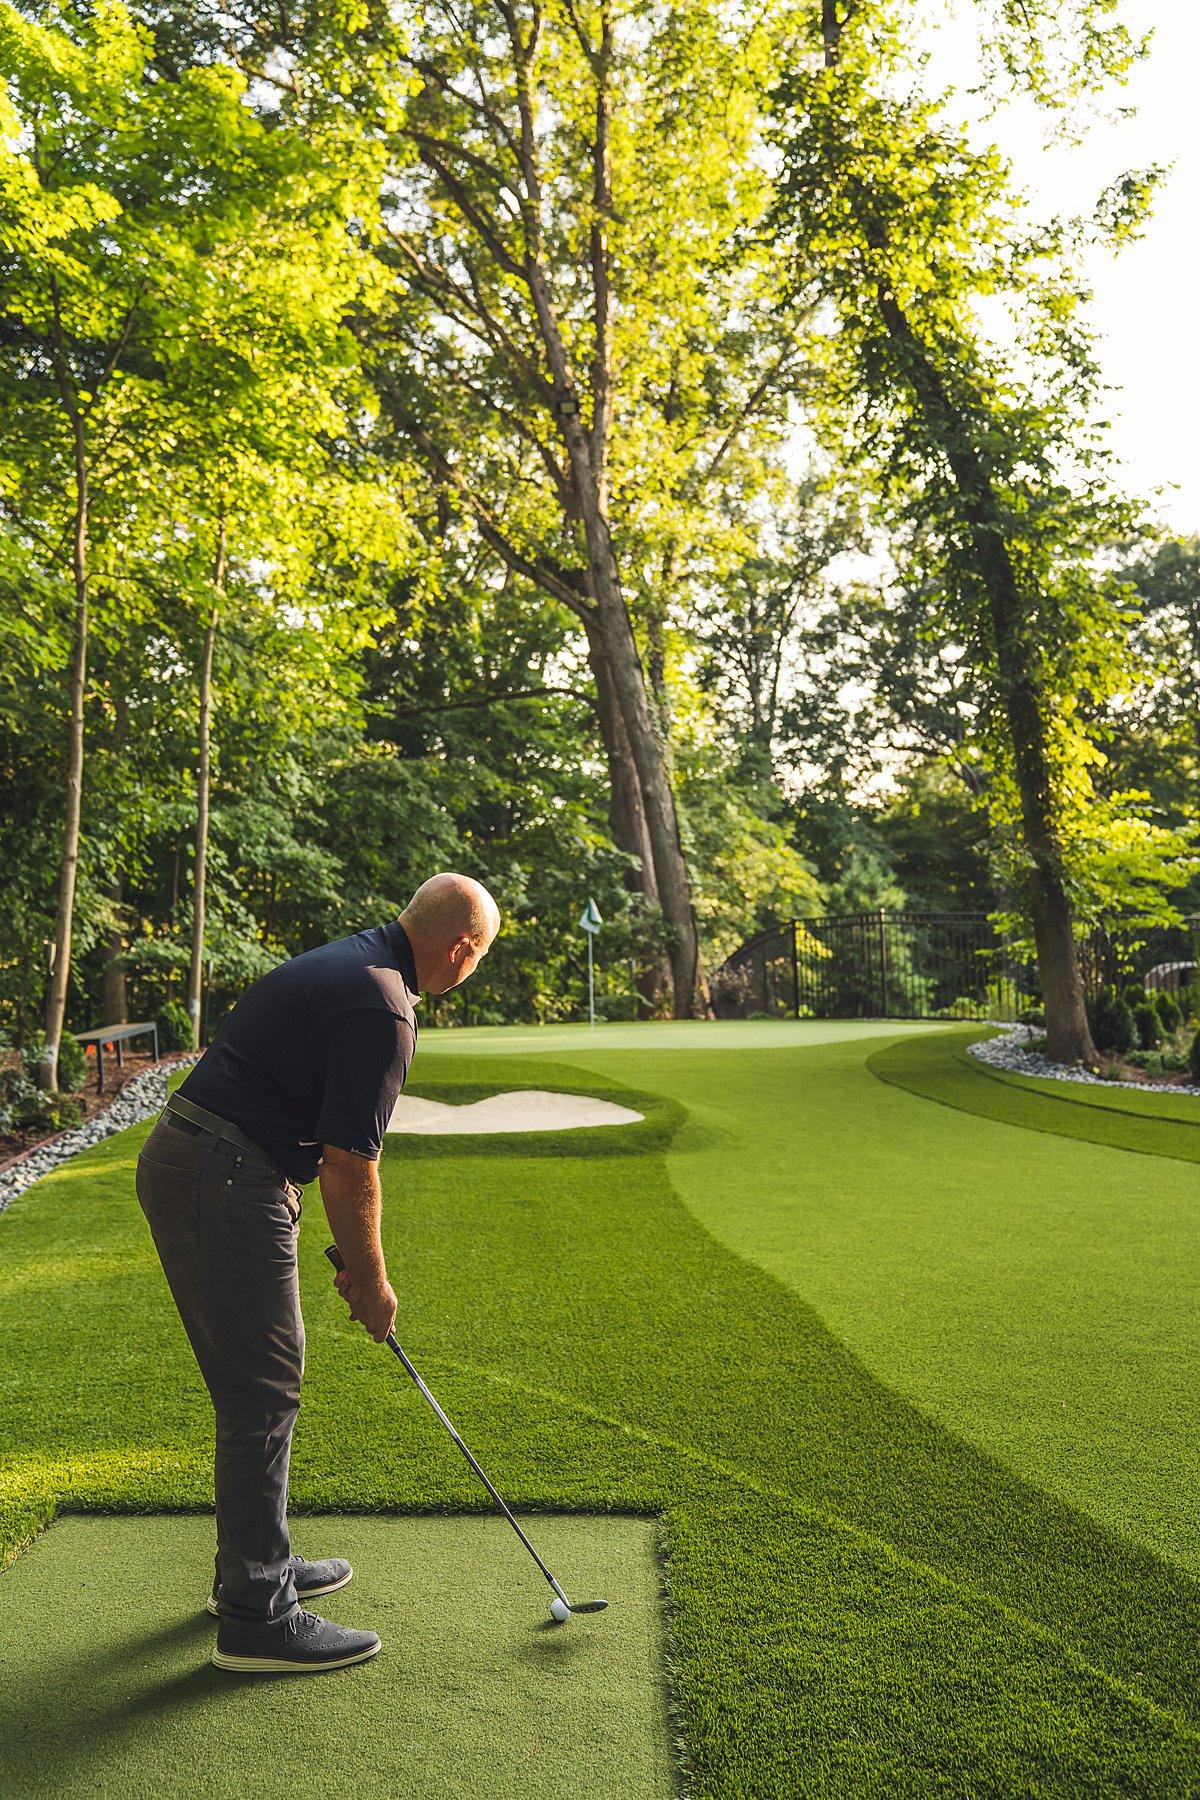 putting-green-chicago-backyard-golf-practice-short game-turf-artificial-grass-99